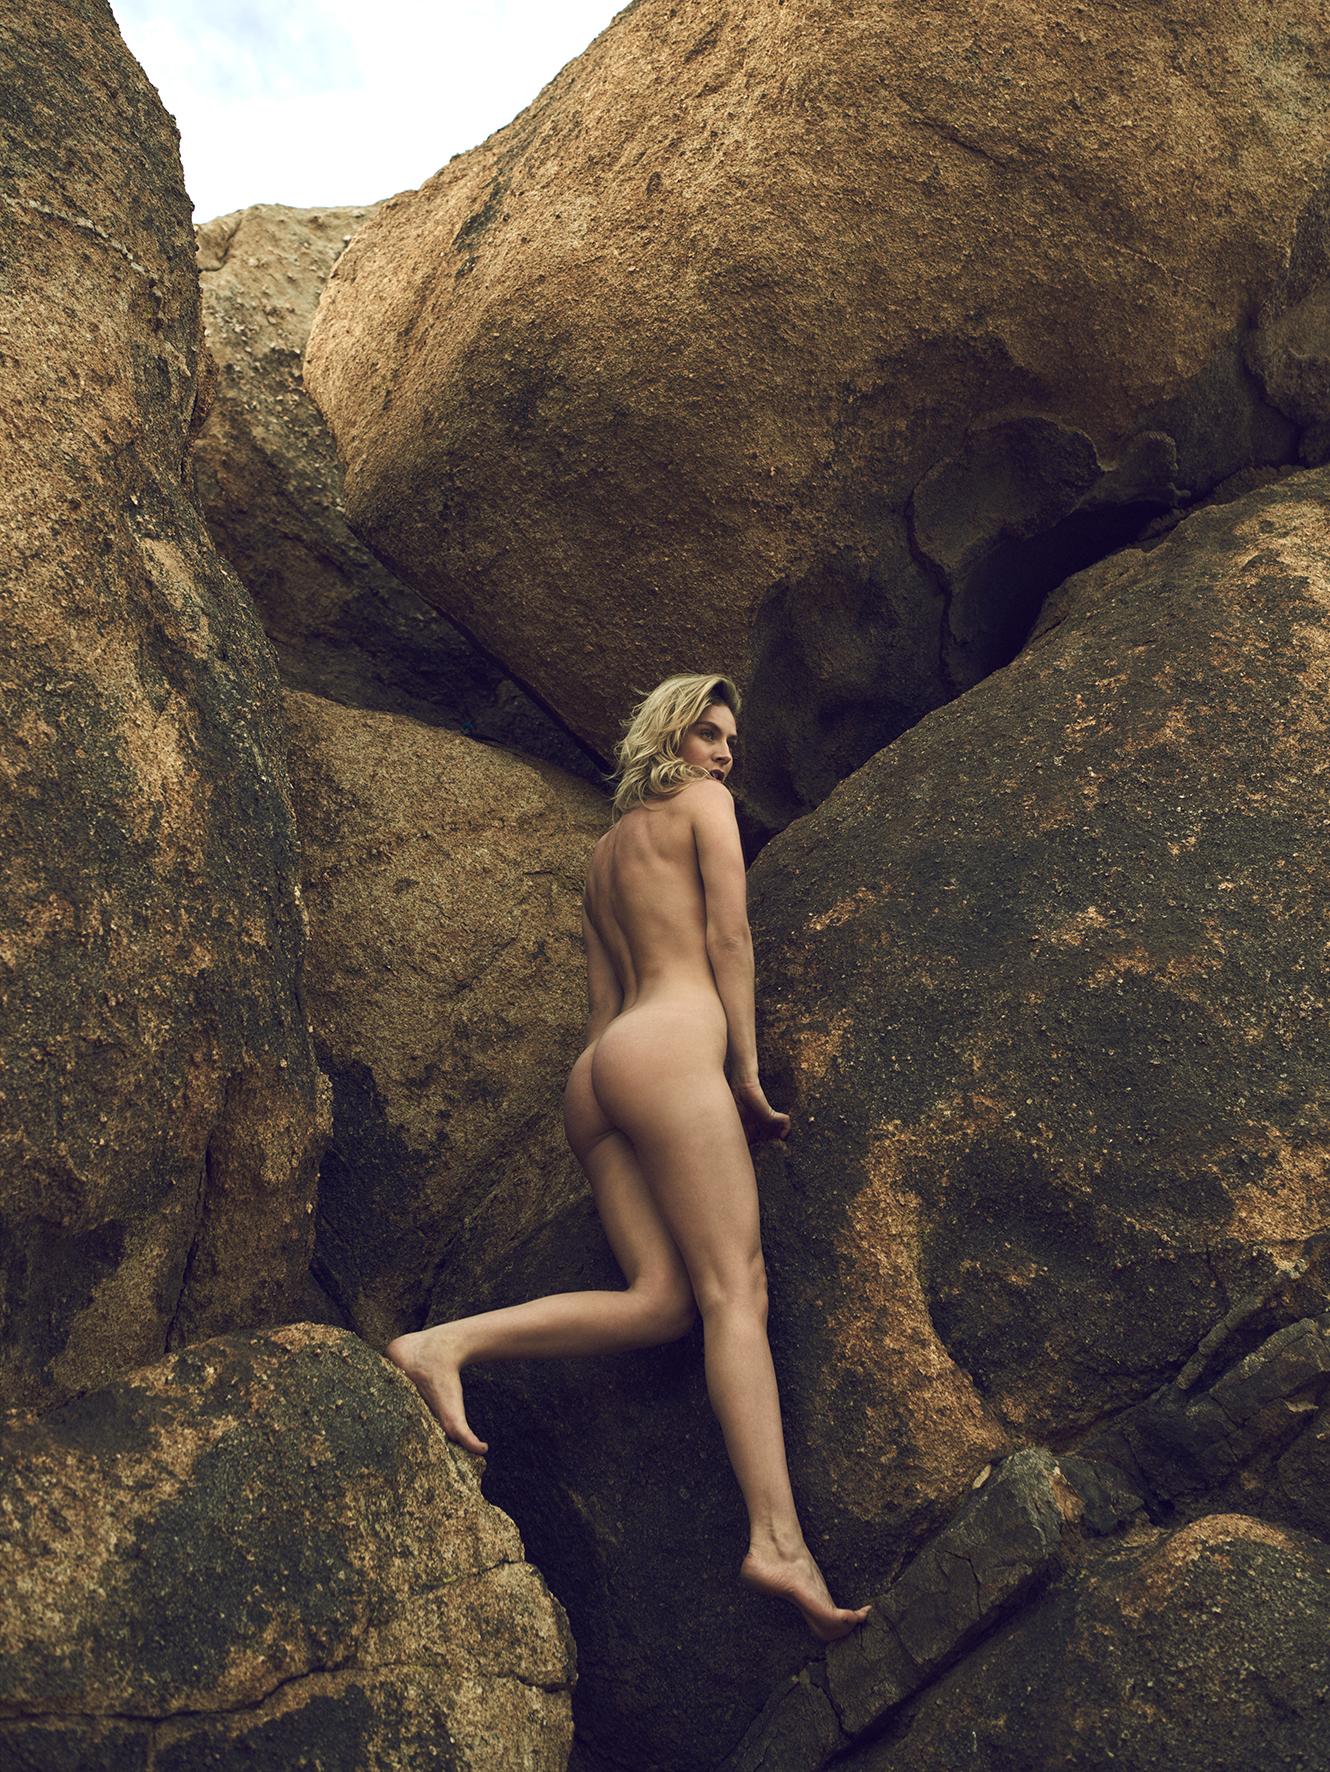 Лорен для издания P Magazine / фото Stefan Rappo